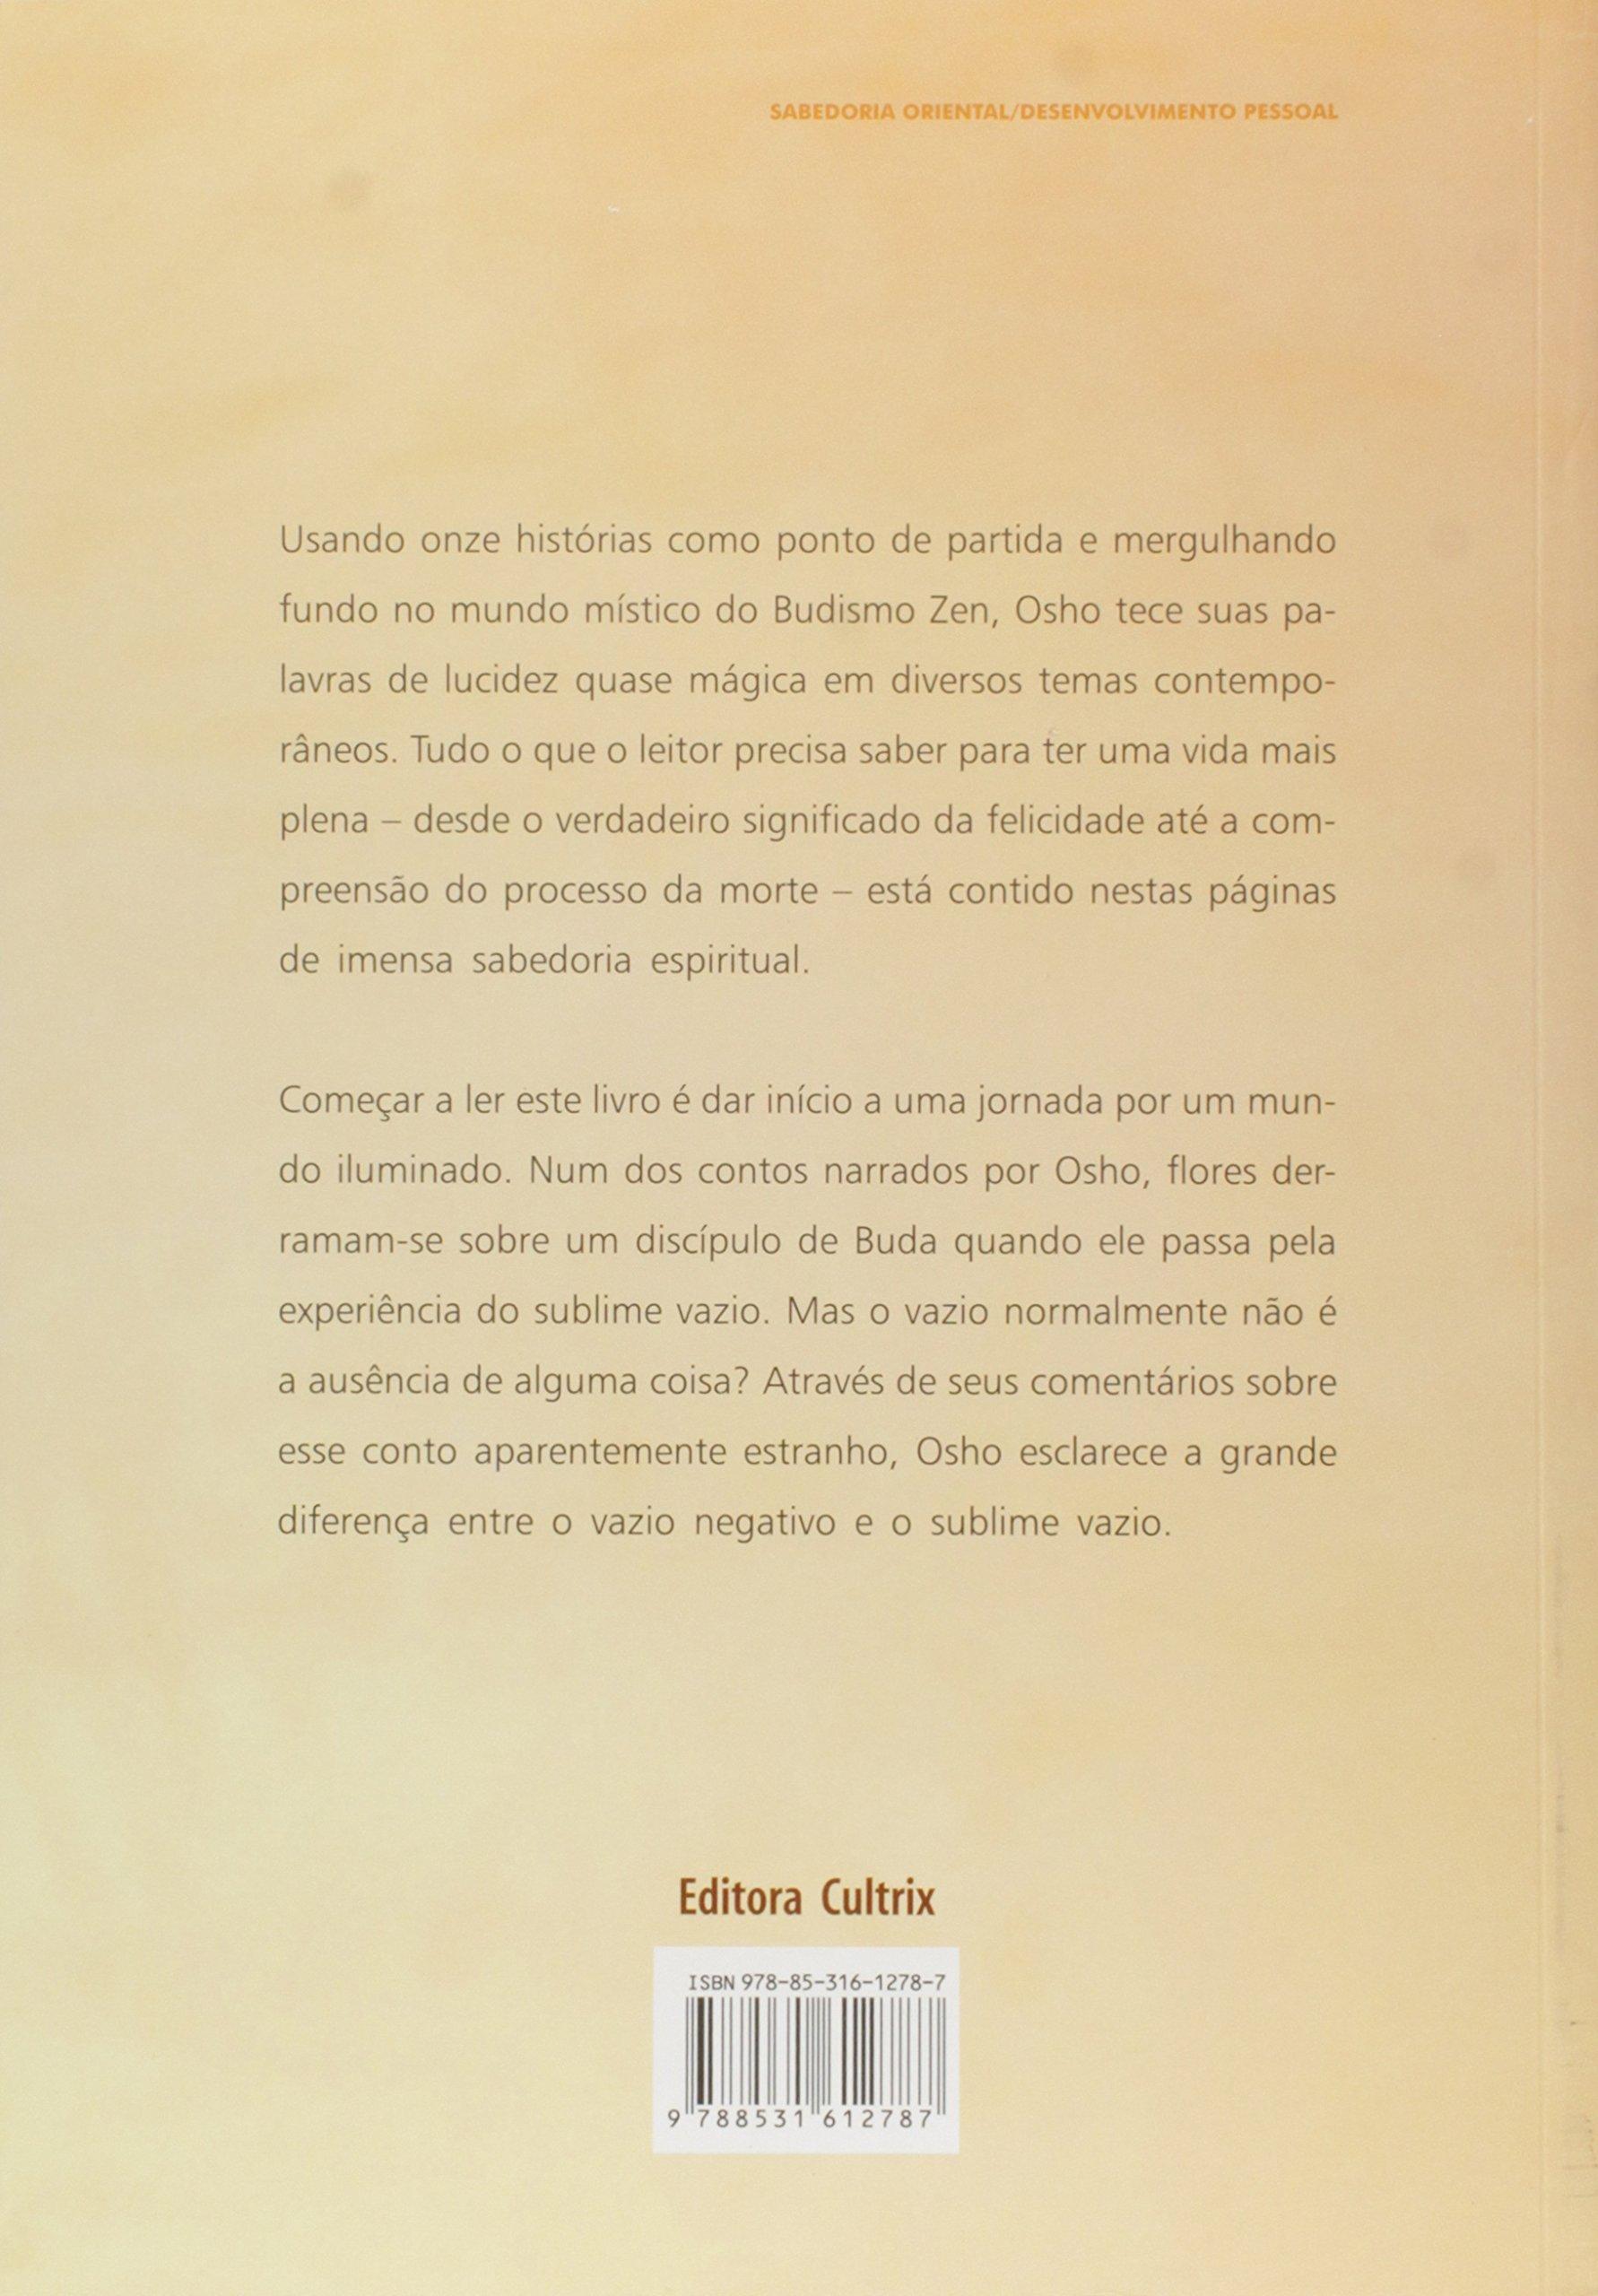 Sublime Vazio Em Portuguese Do Brasil Osho 9788531612787 Amazon